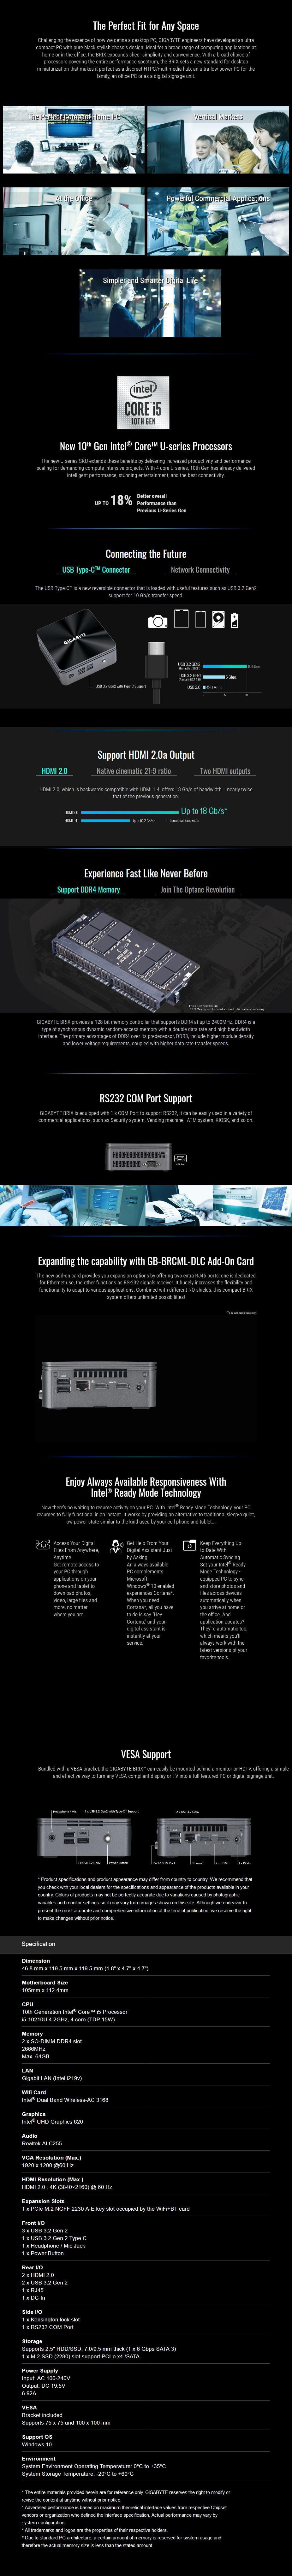 Gigabyte Brix GB-BRi5H-10210 Barebone Kit - Intel i5-10210U Processor - Overview 1